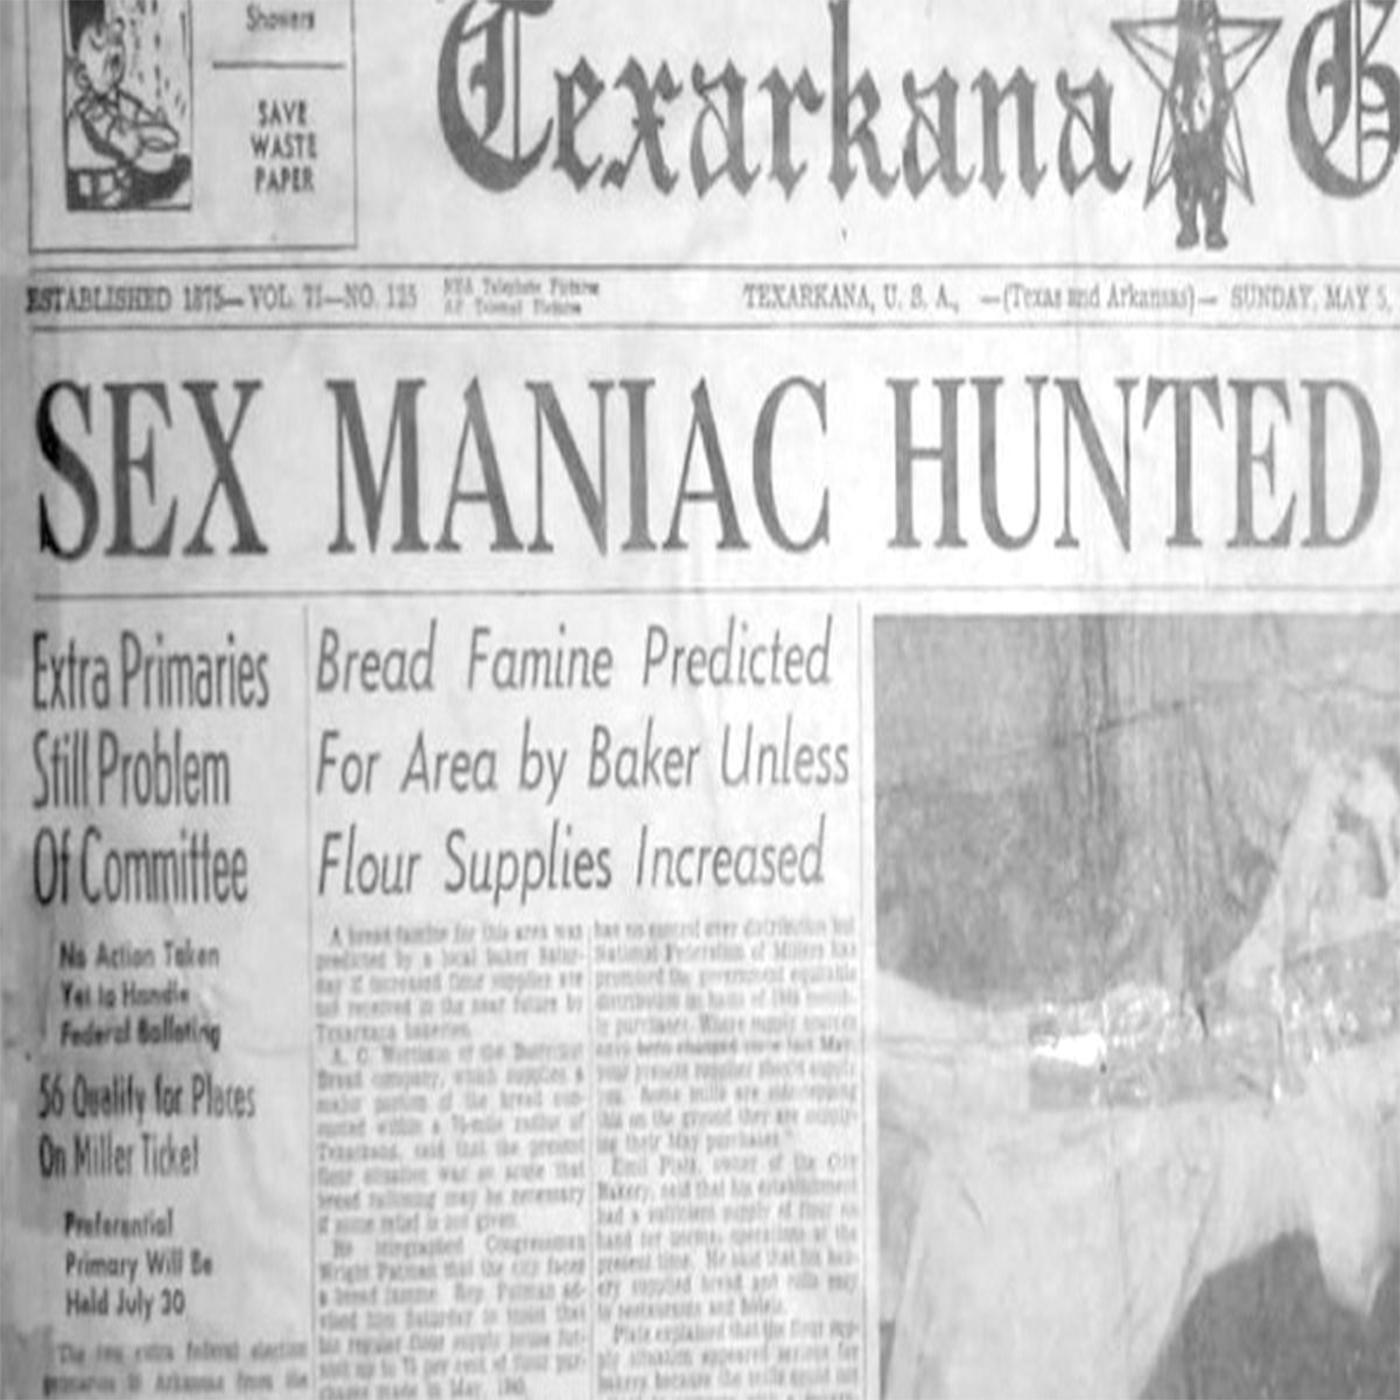 The Texarkana Moonlight Murders